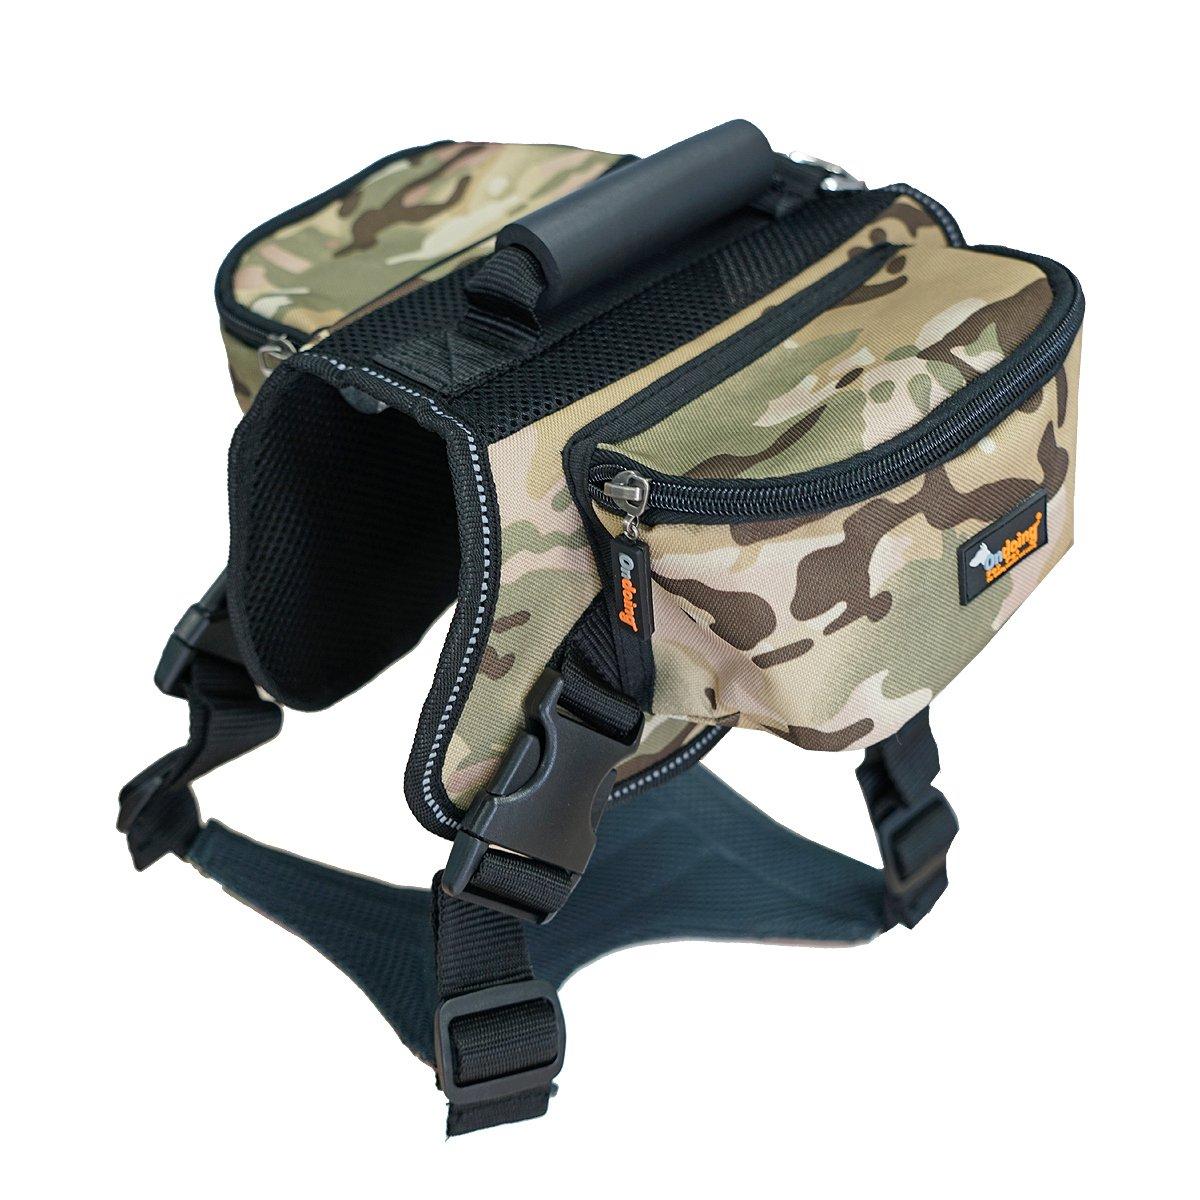 Ondoing Dog Backpack Adjustable Dog Saddle Bag Dog Pack Pet Harness with Reflective Strip for Medium and Large Dogs Training Hiking Camping L Camoflauge